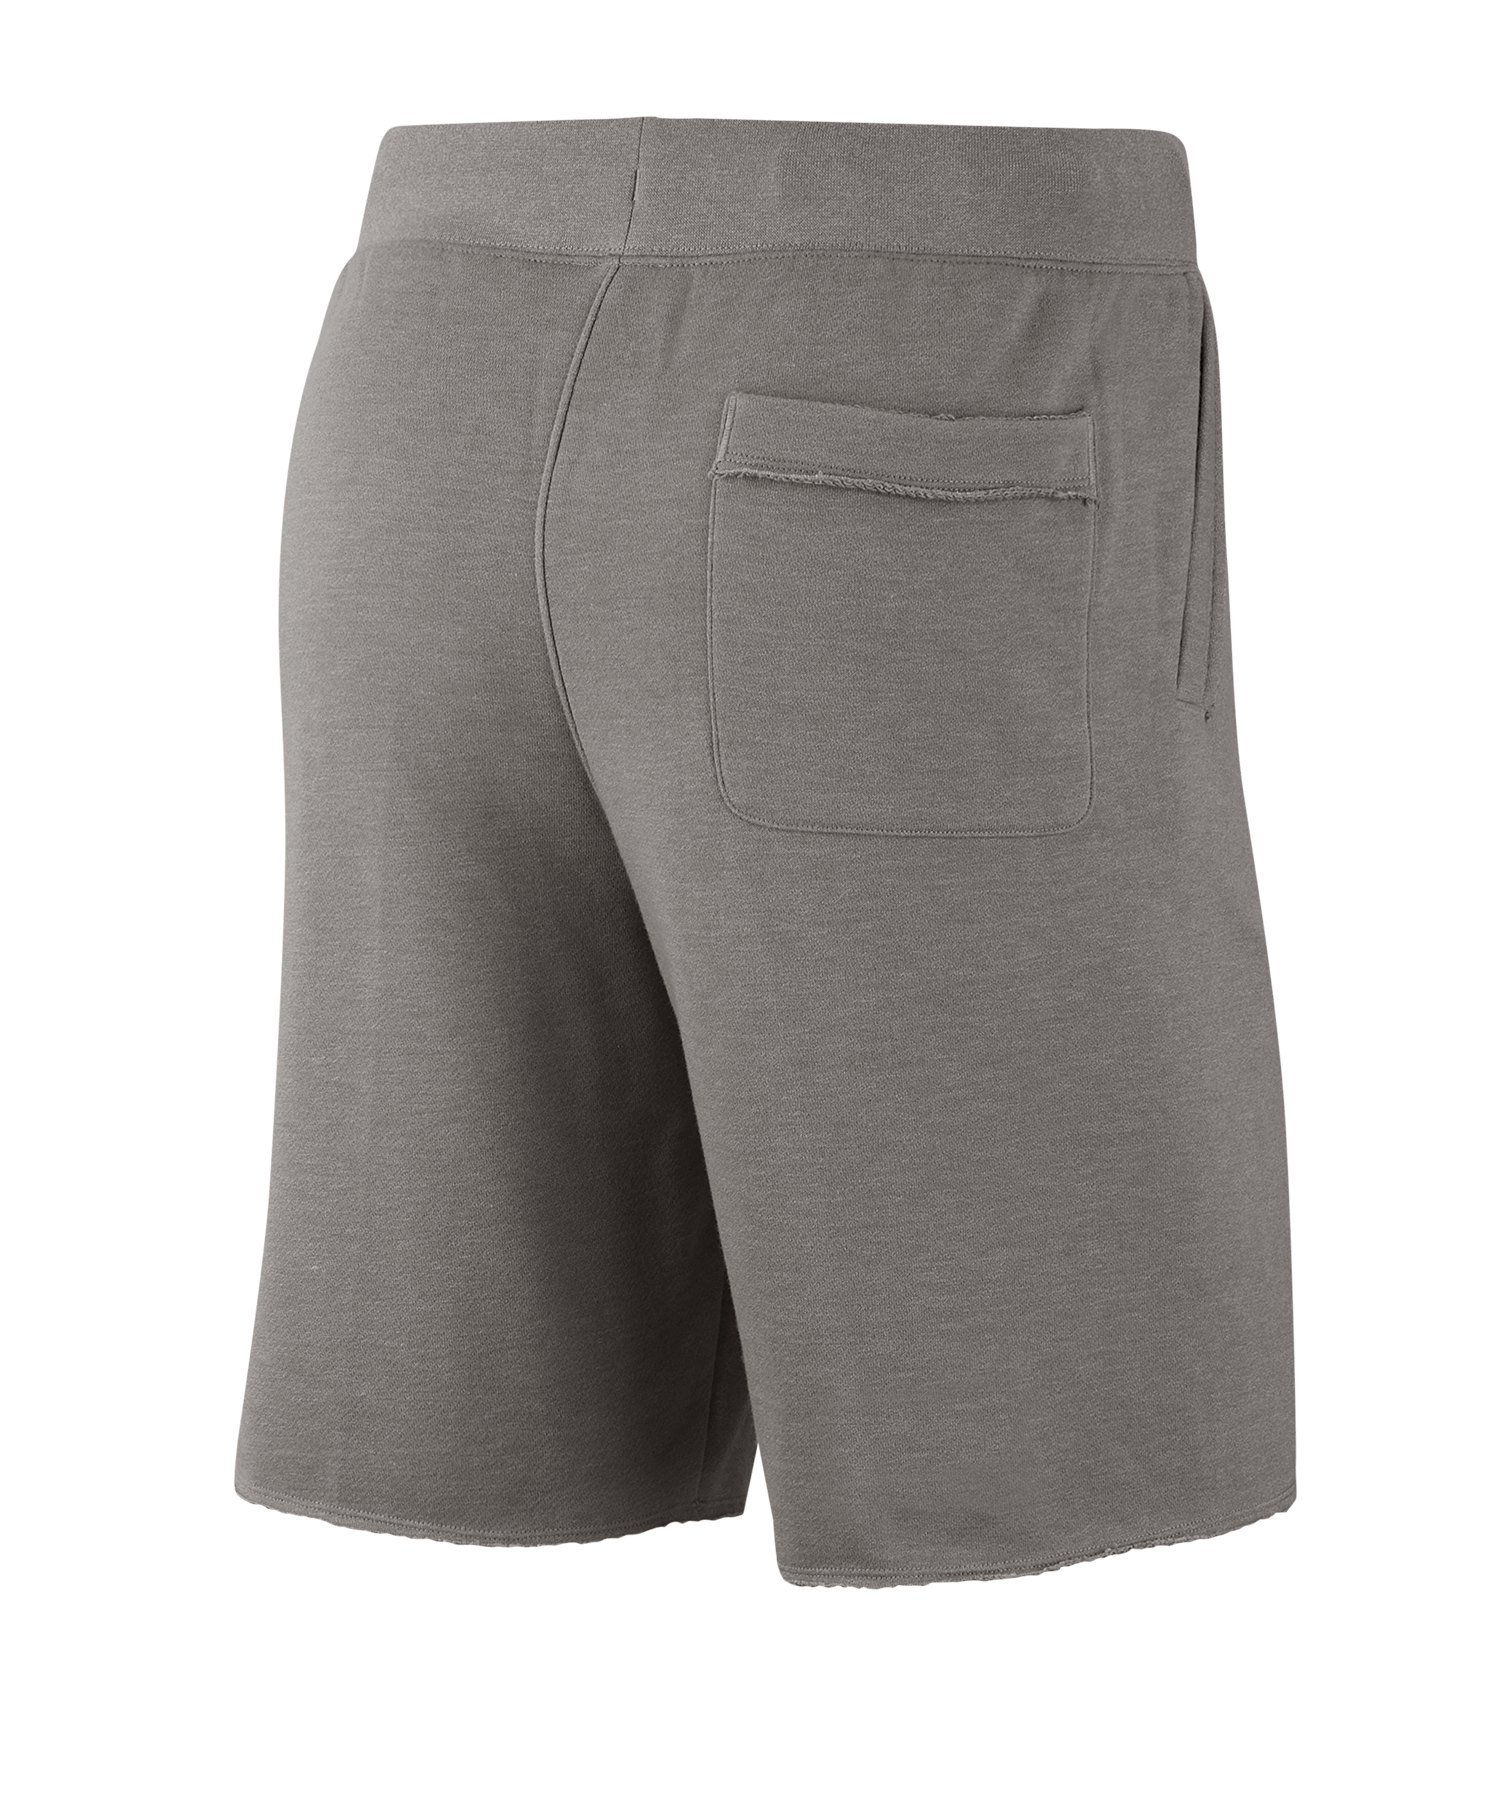 Short kurz Grau Nike Hose F071 34ScAjLq5R